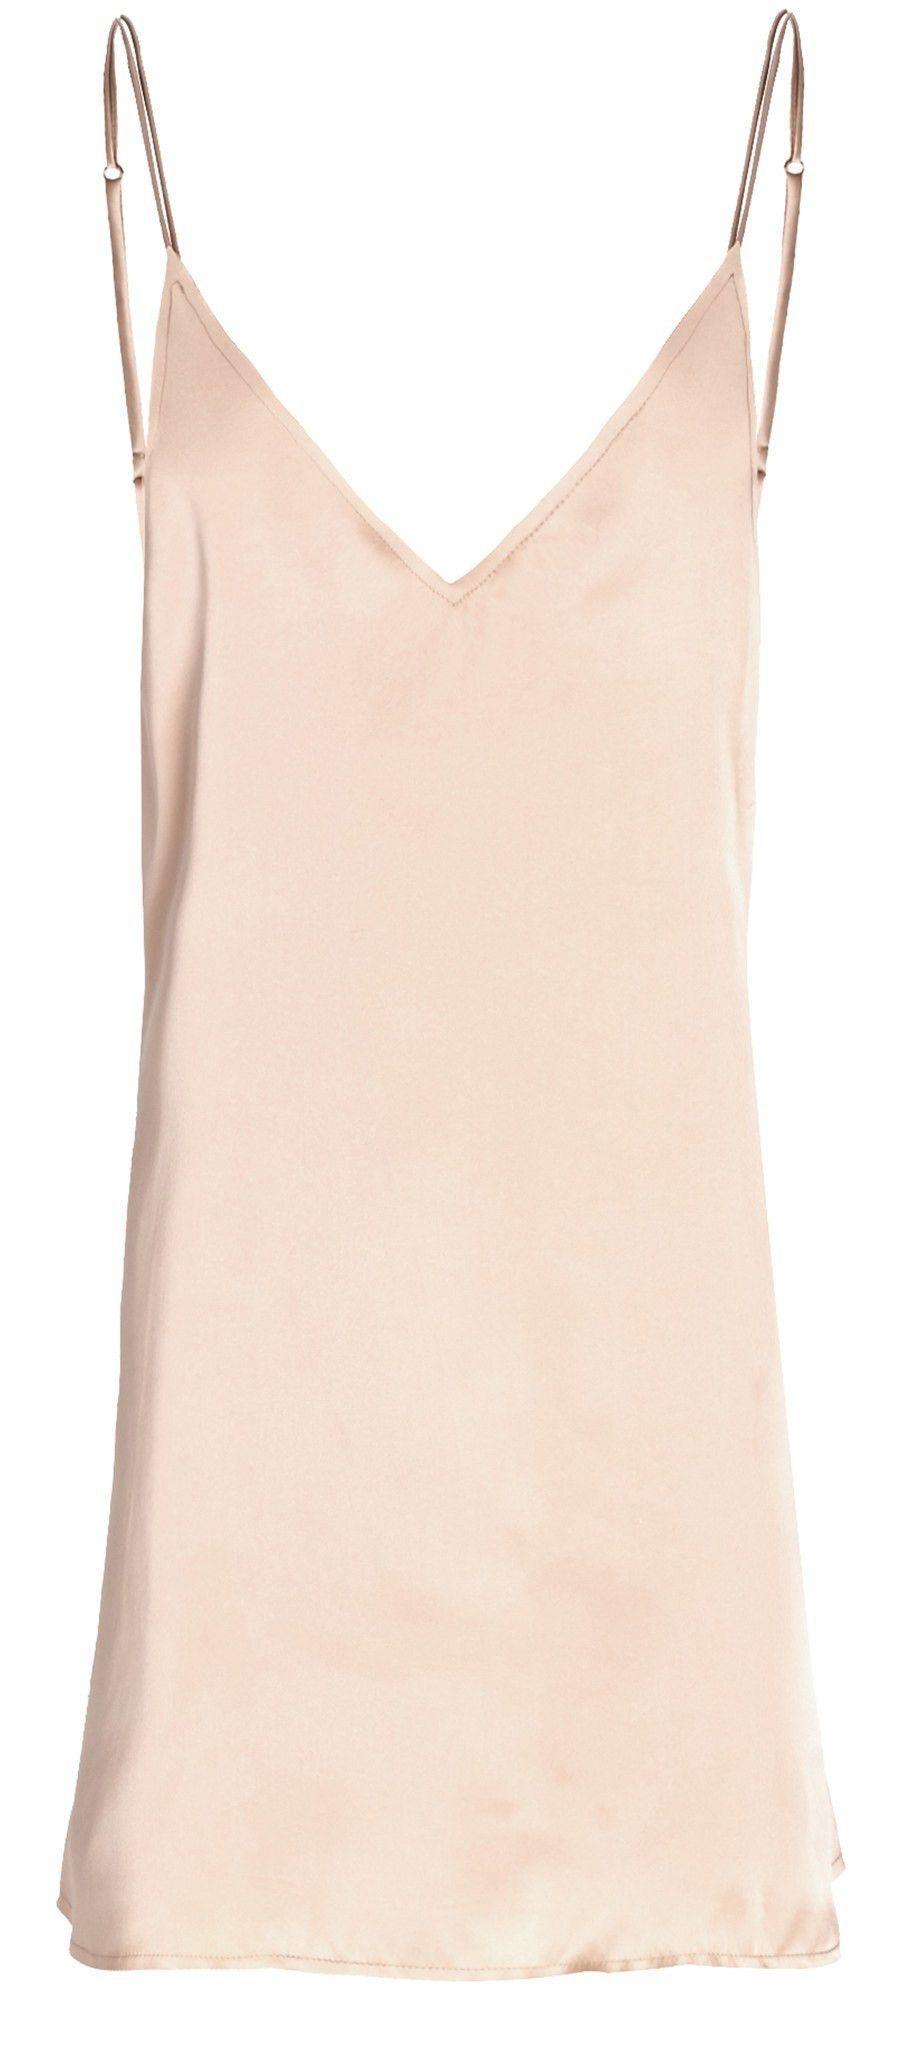 Zillah Slip Dress | D R E S S E S♡ | Pinterest | Vestidos, Ropa y Moda